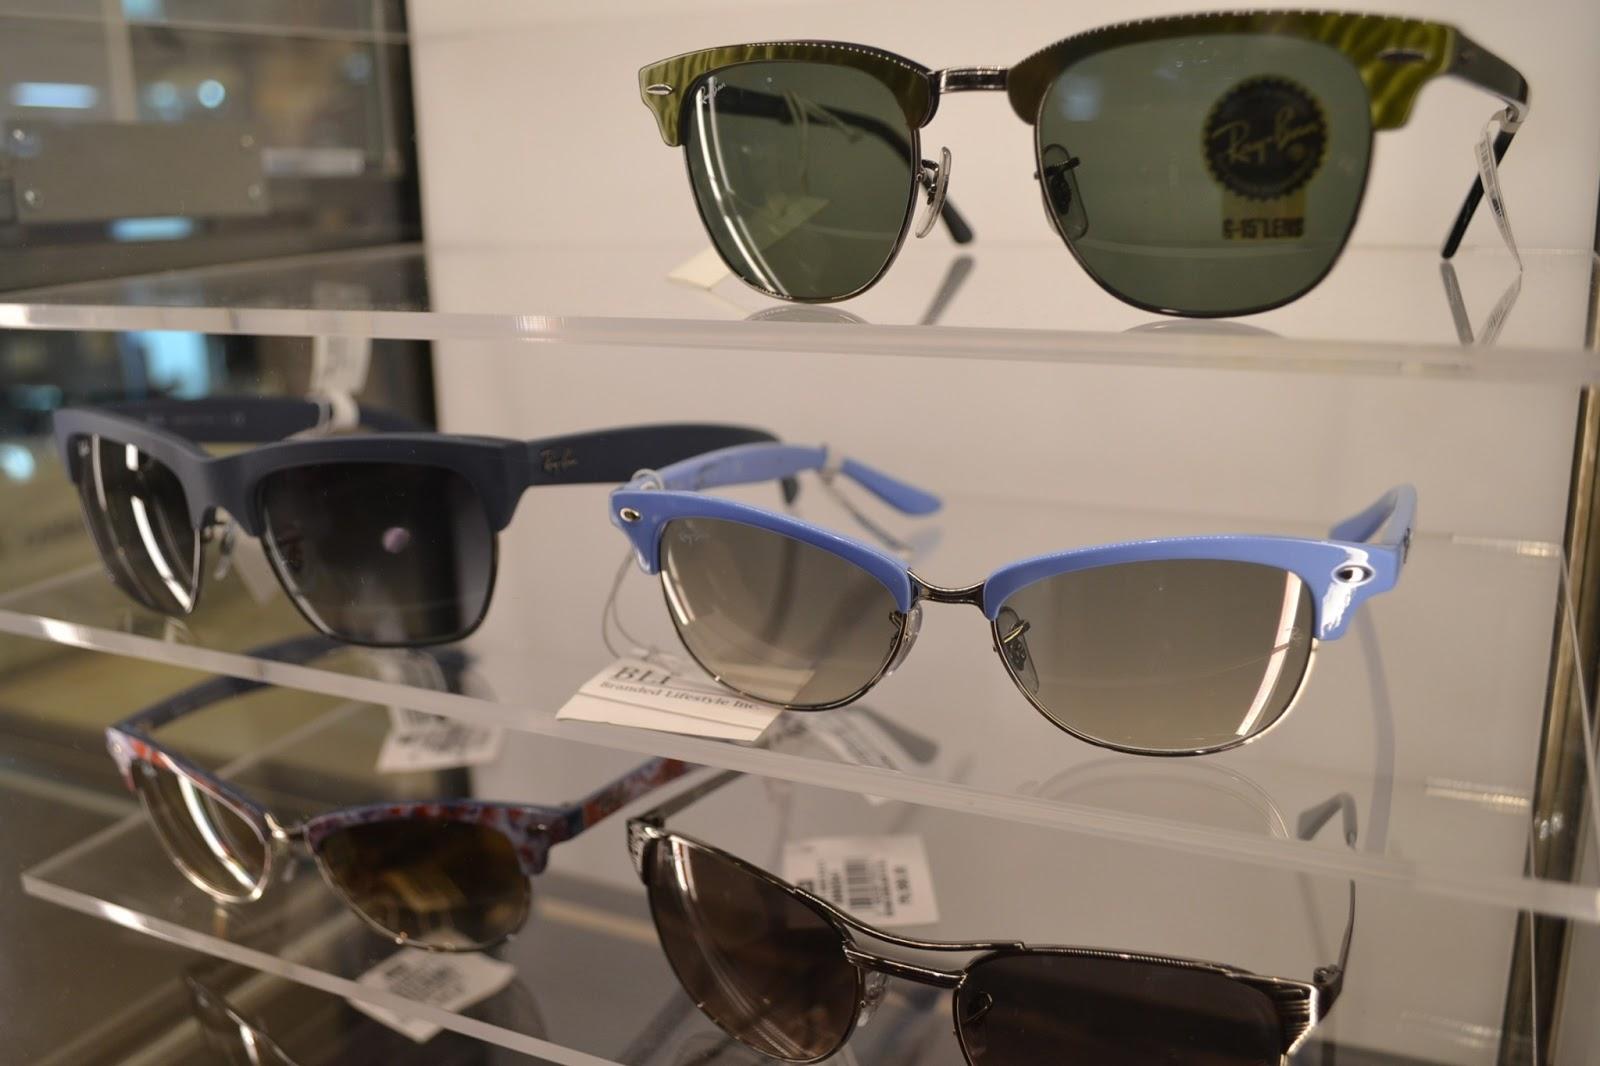 ray ban aviator sunglasses price in philippines